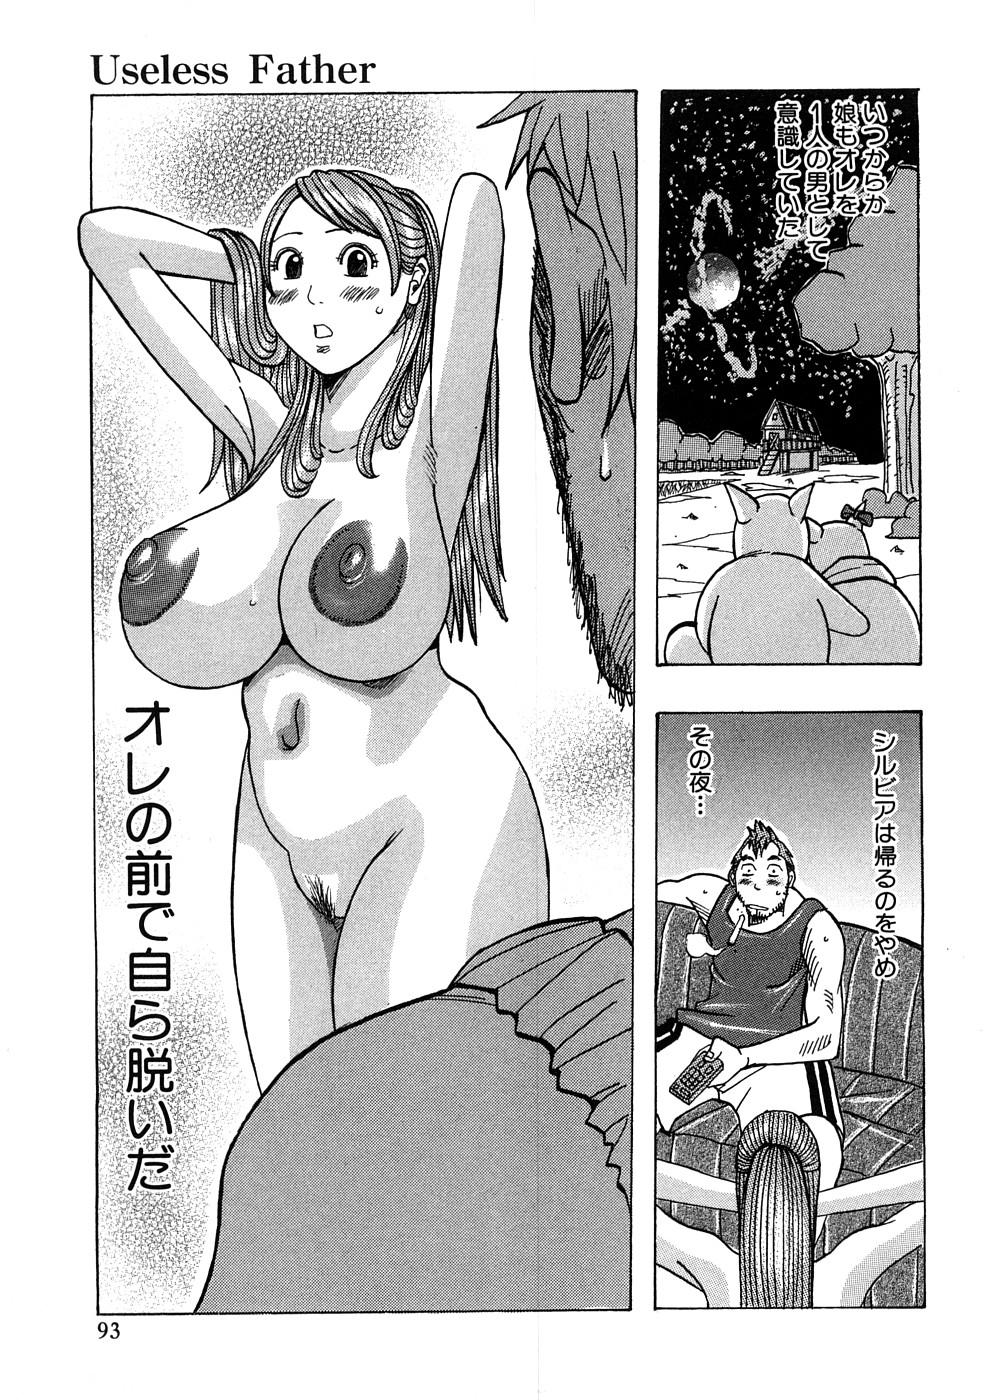 Geki Yaba Anthology Vol. 1 - Naka ni Dashite yo 93